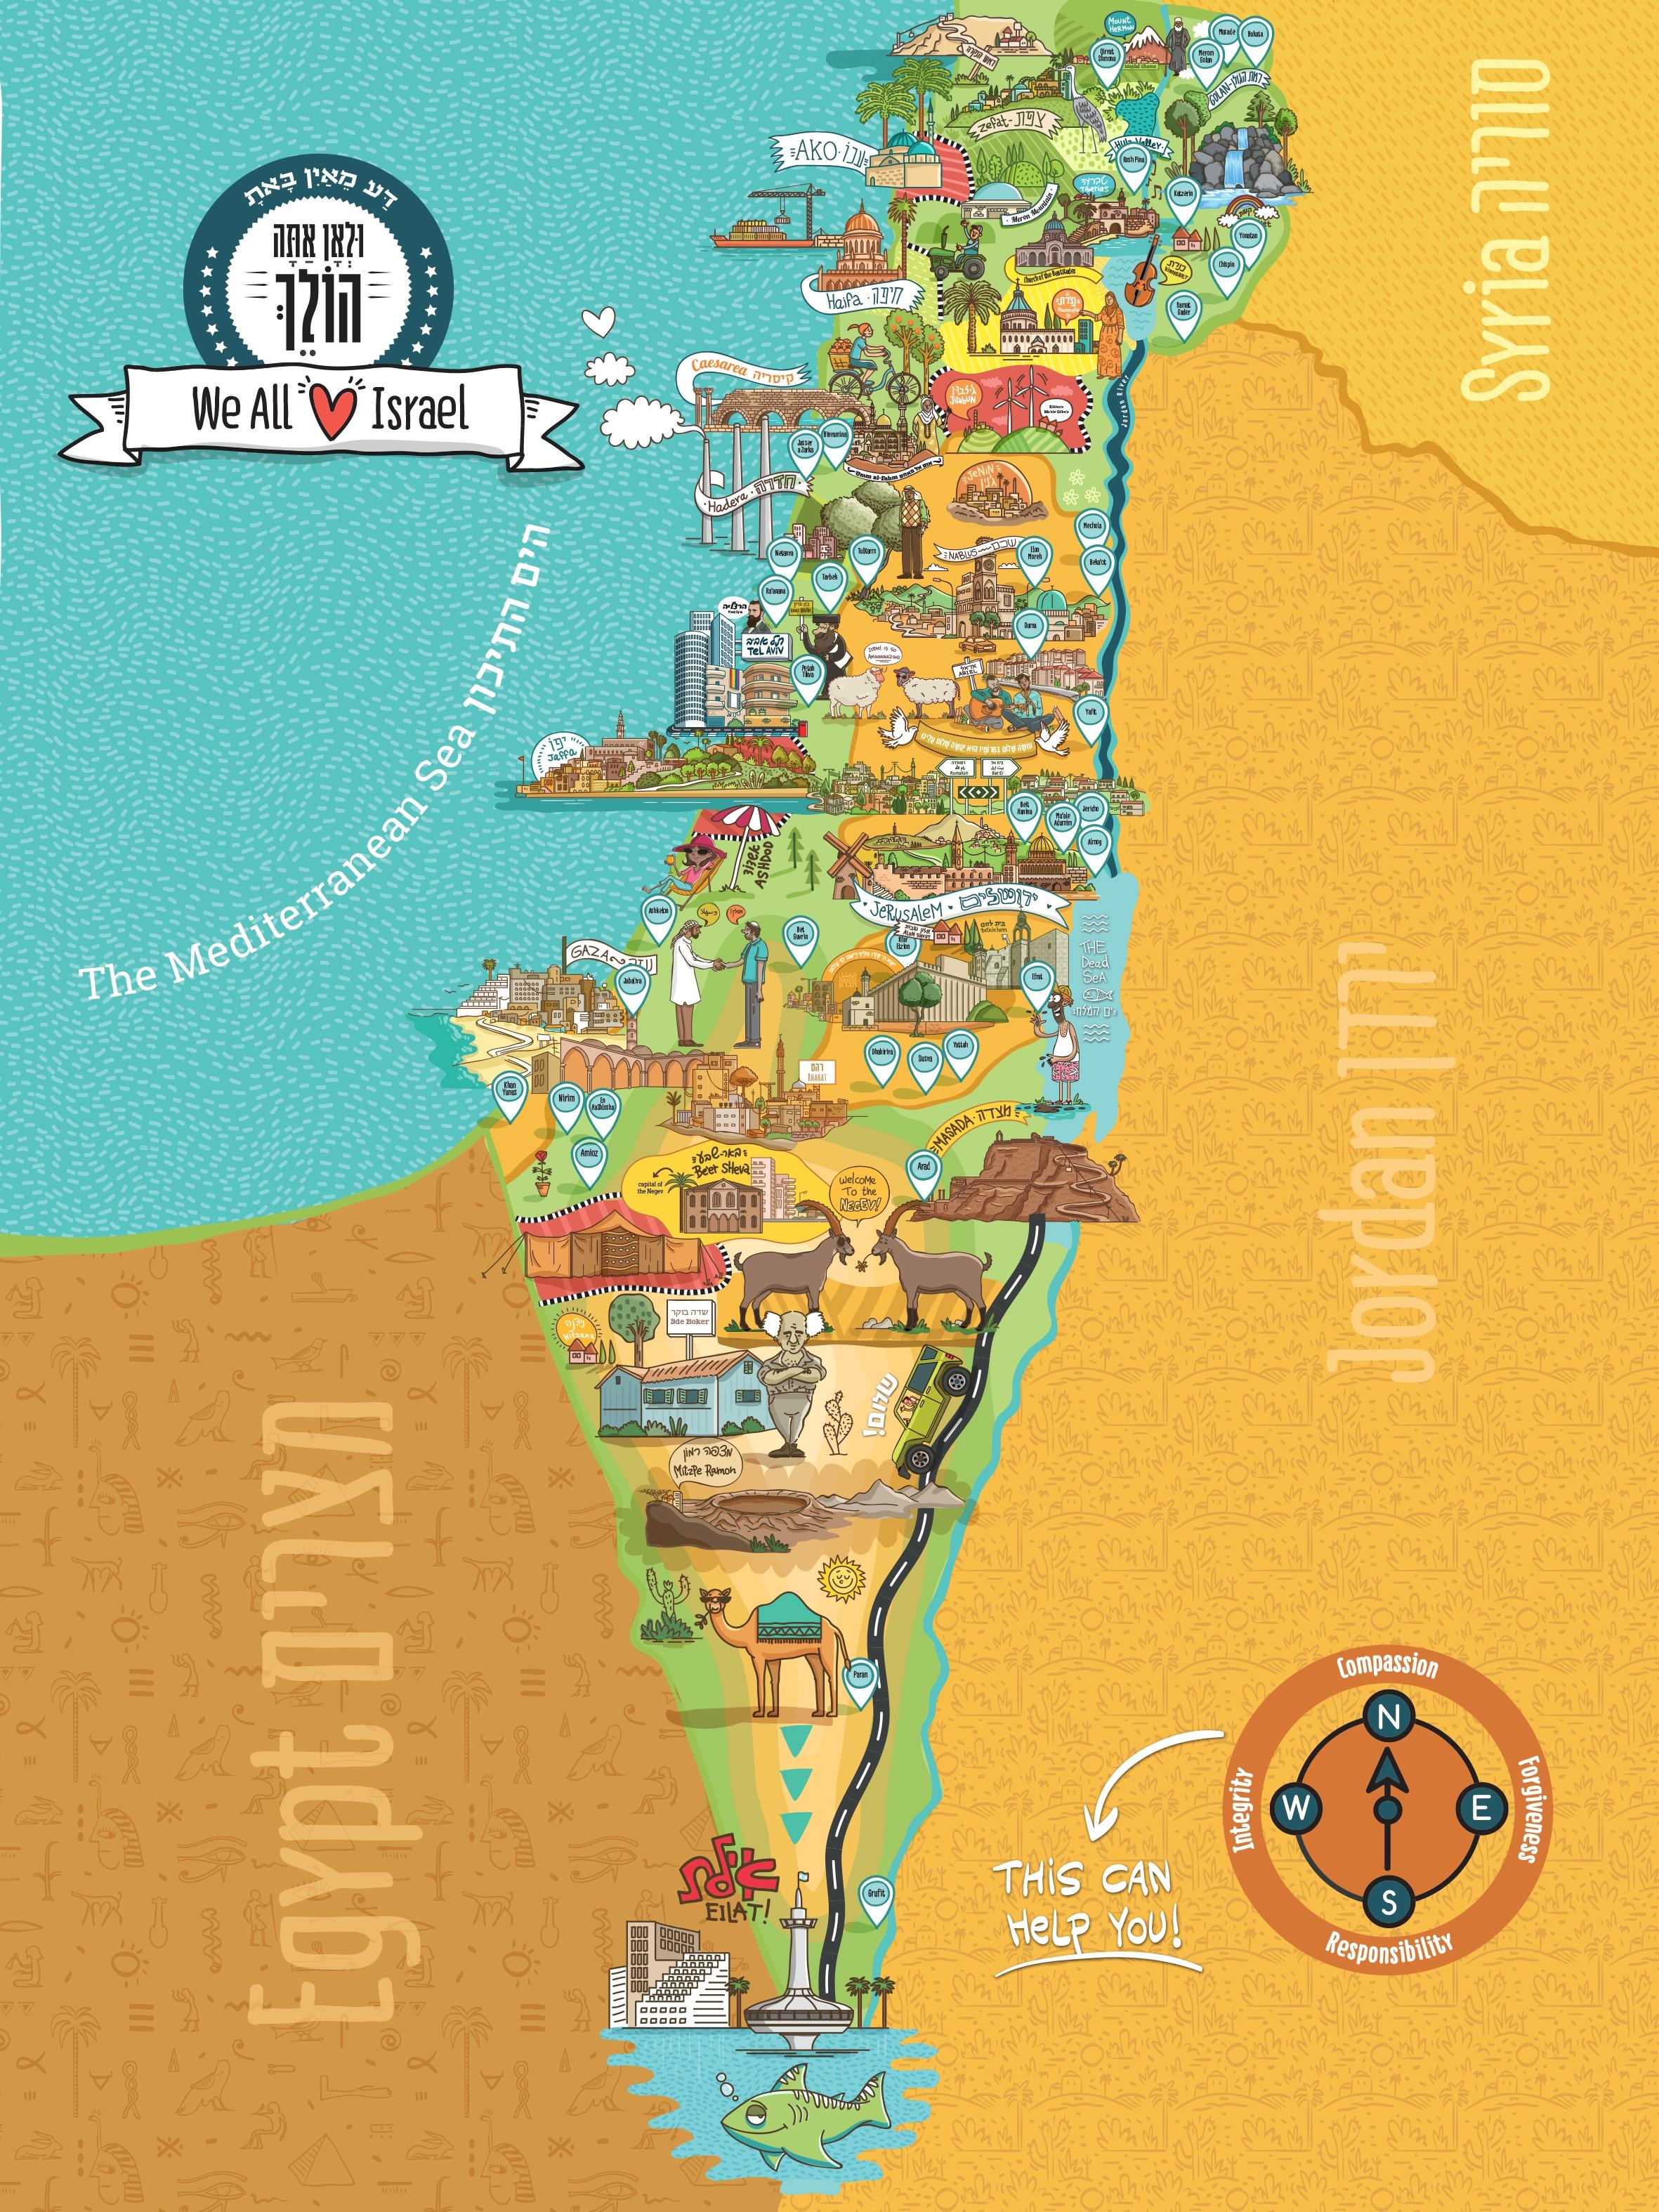 Virtual Tours of Israel